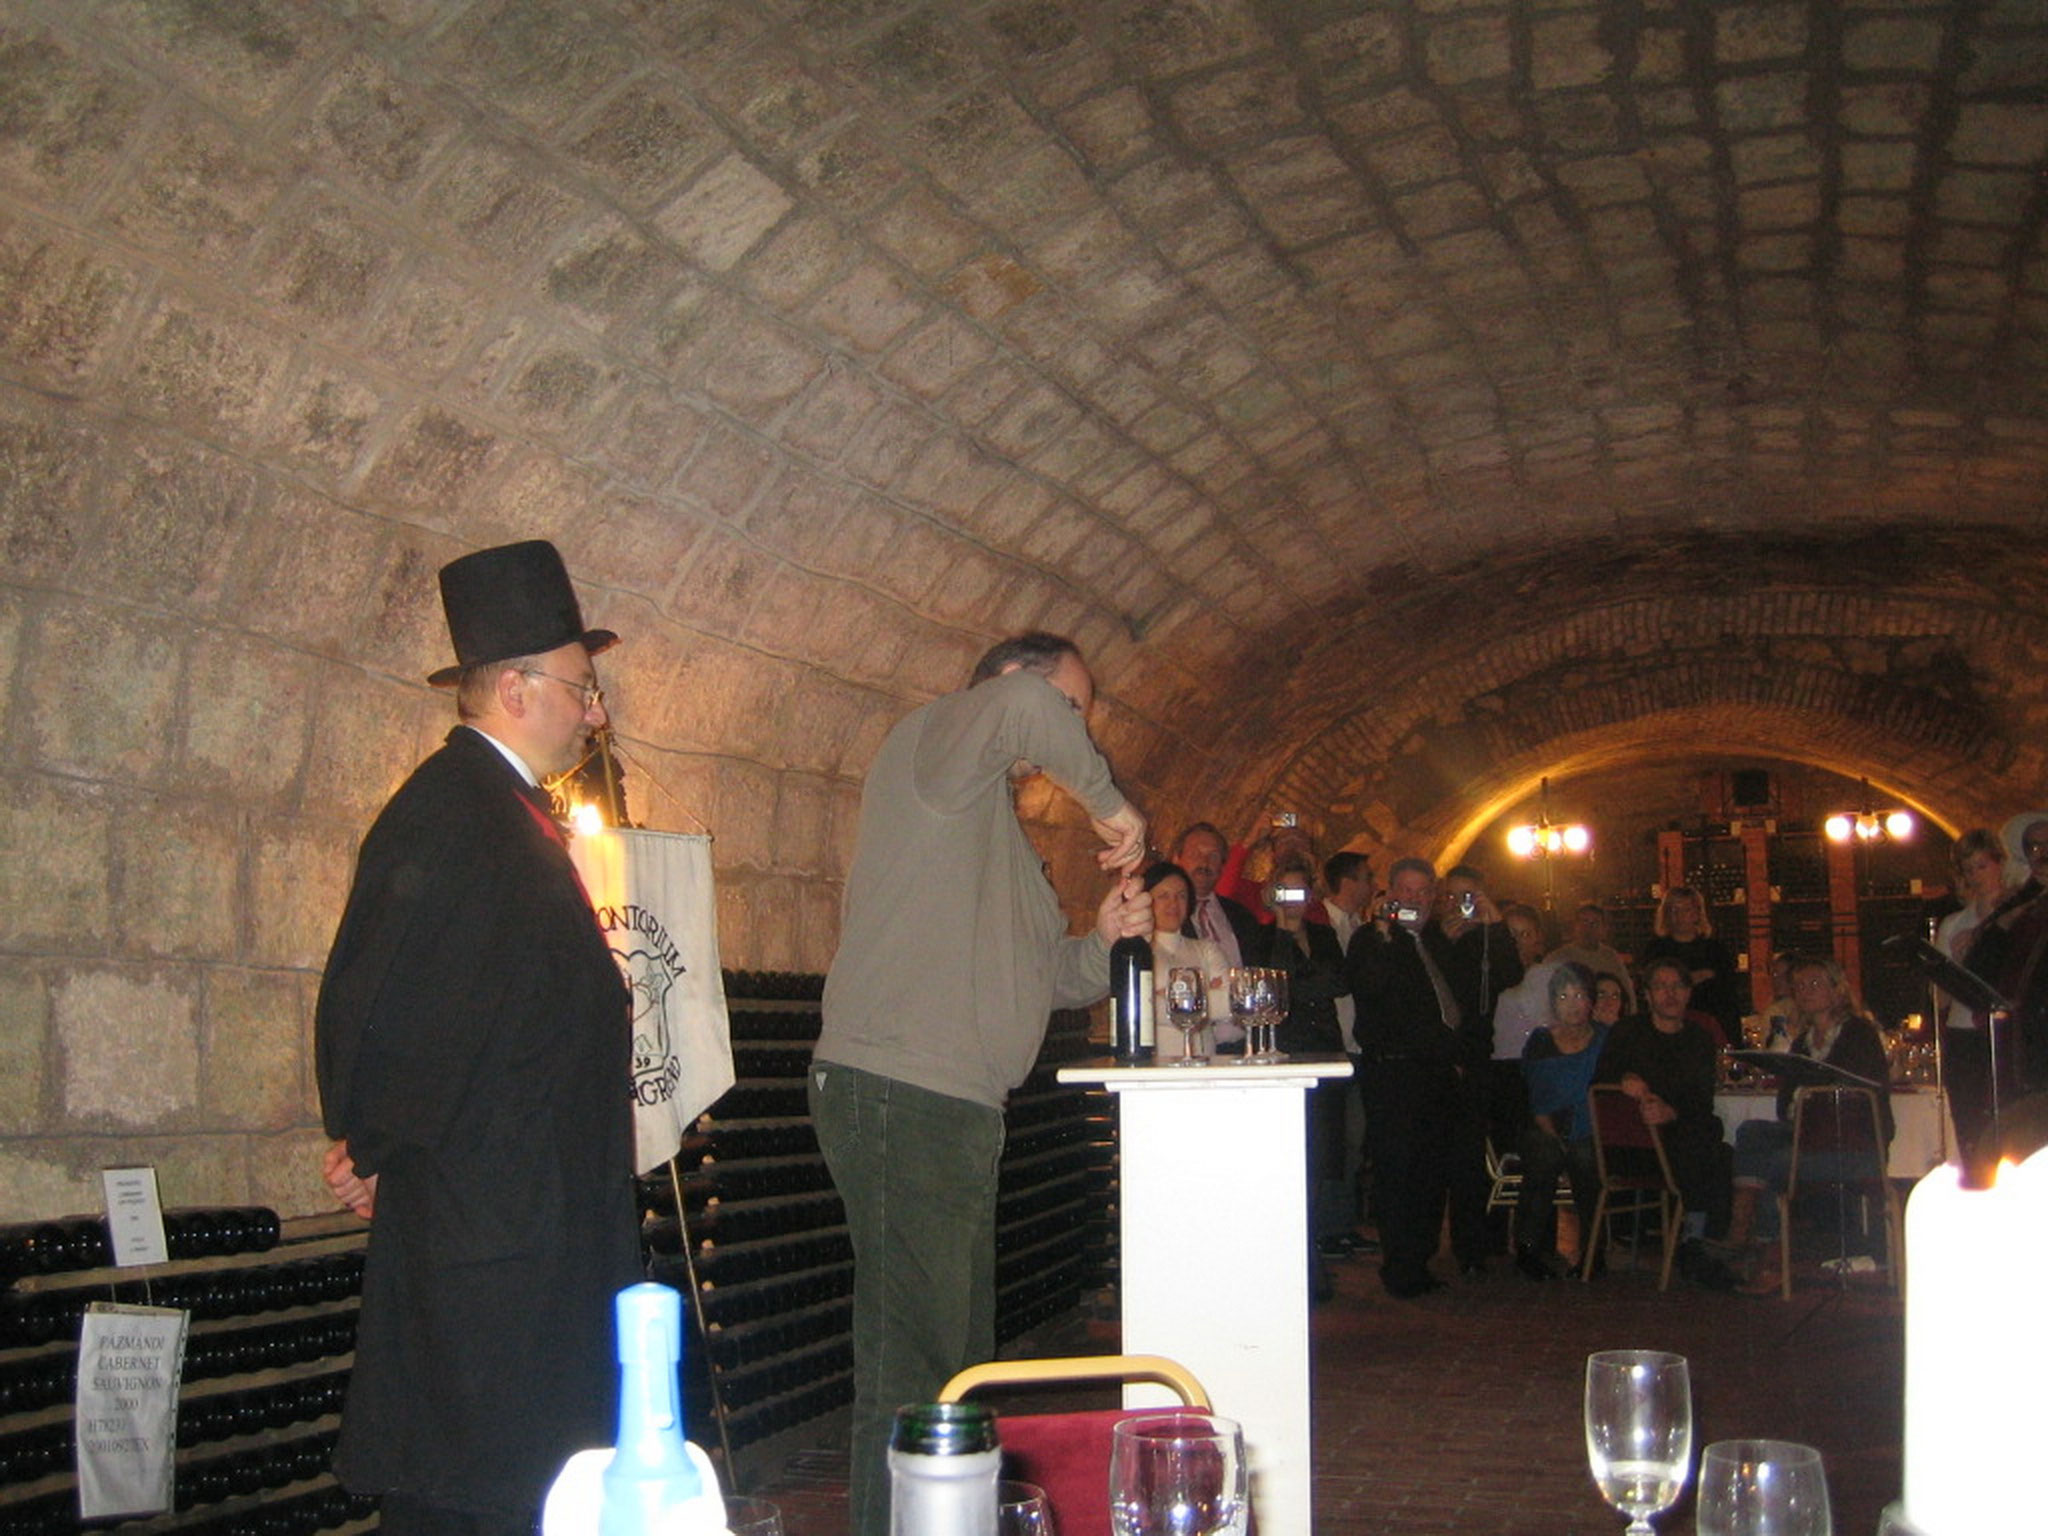 Visiting Budapest 2005 (Visegrad)